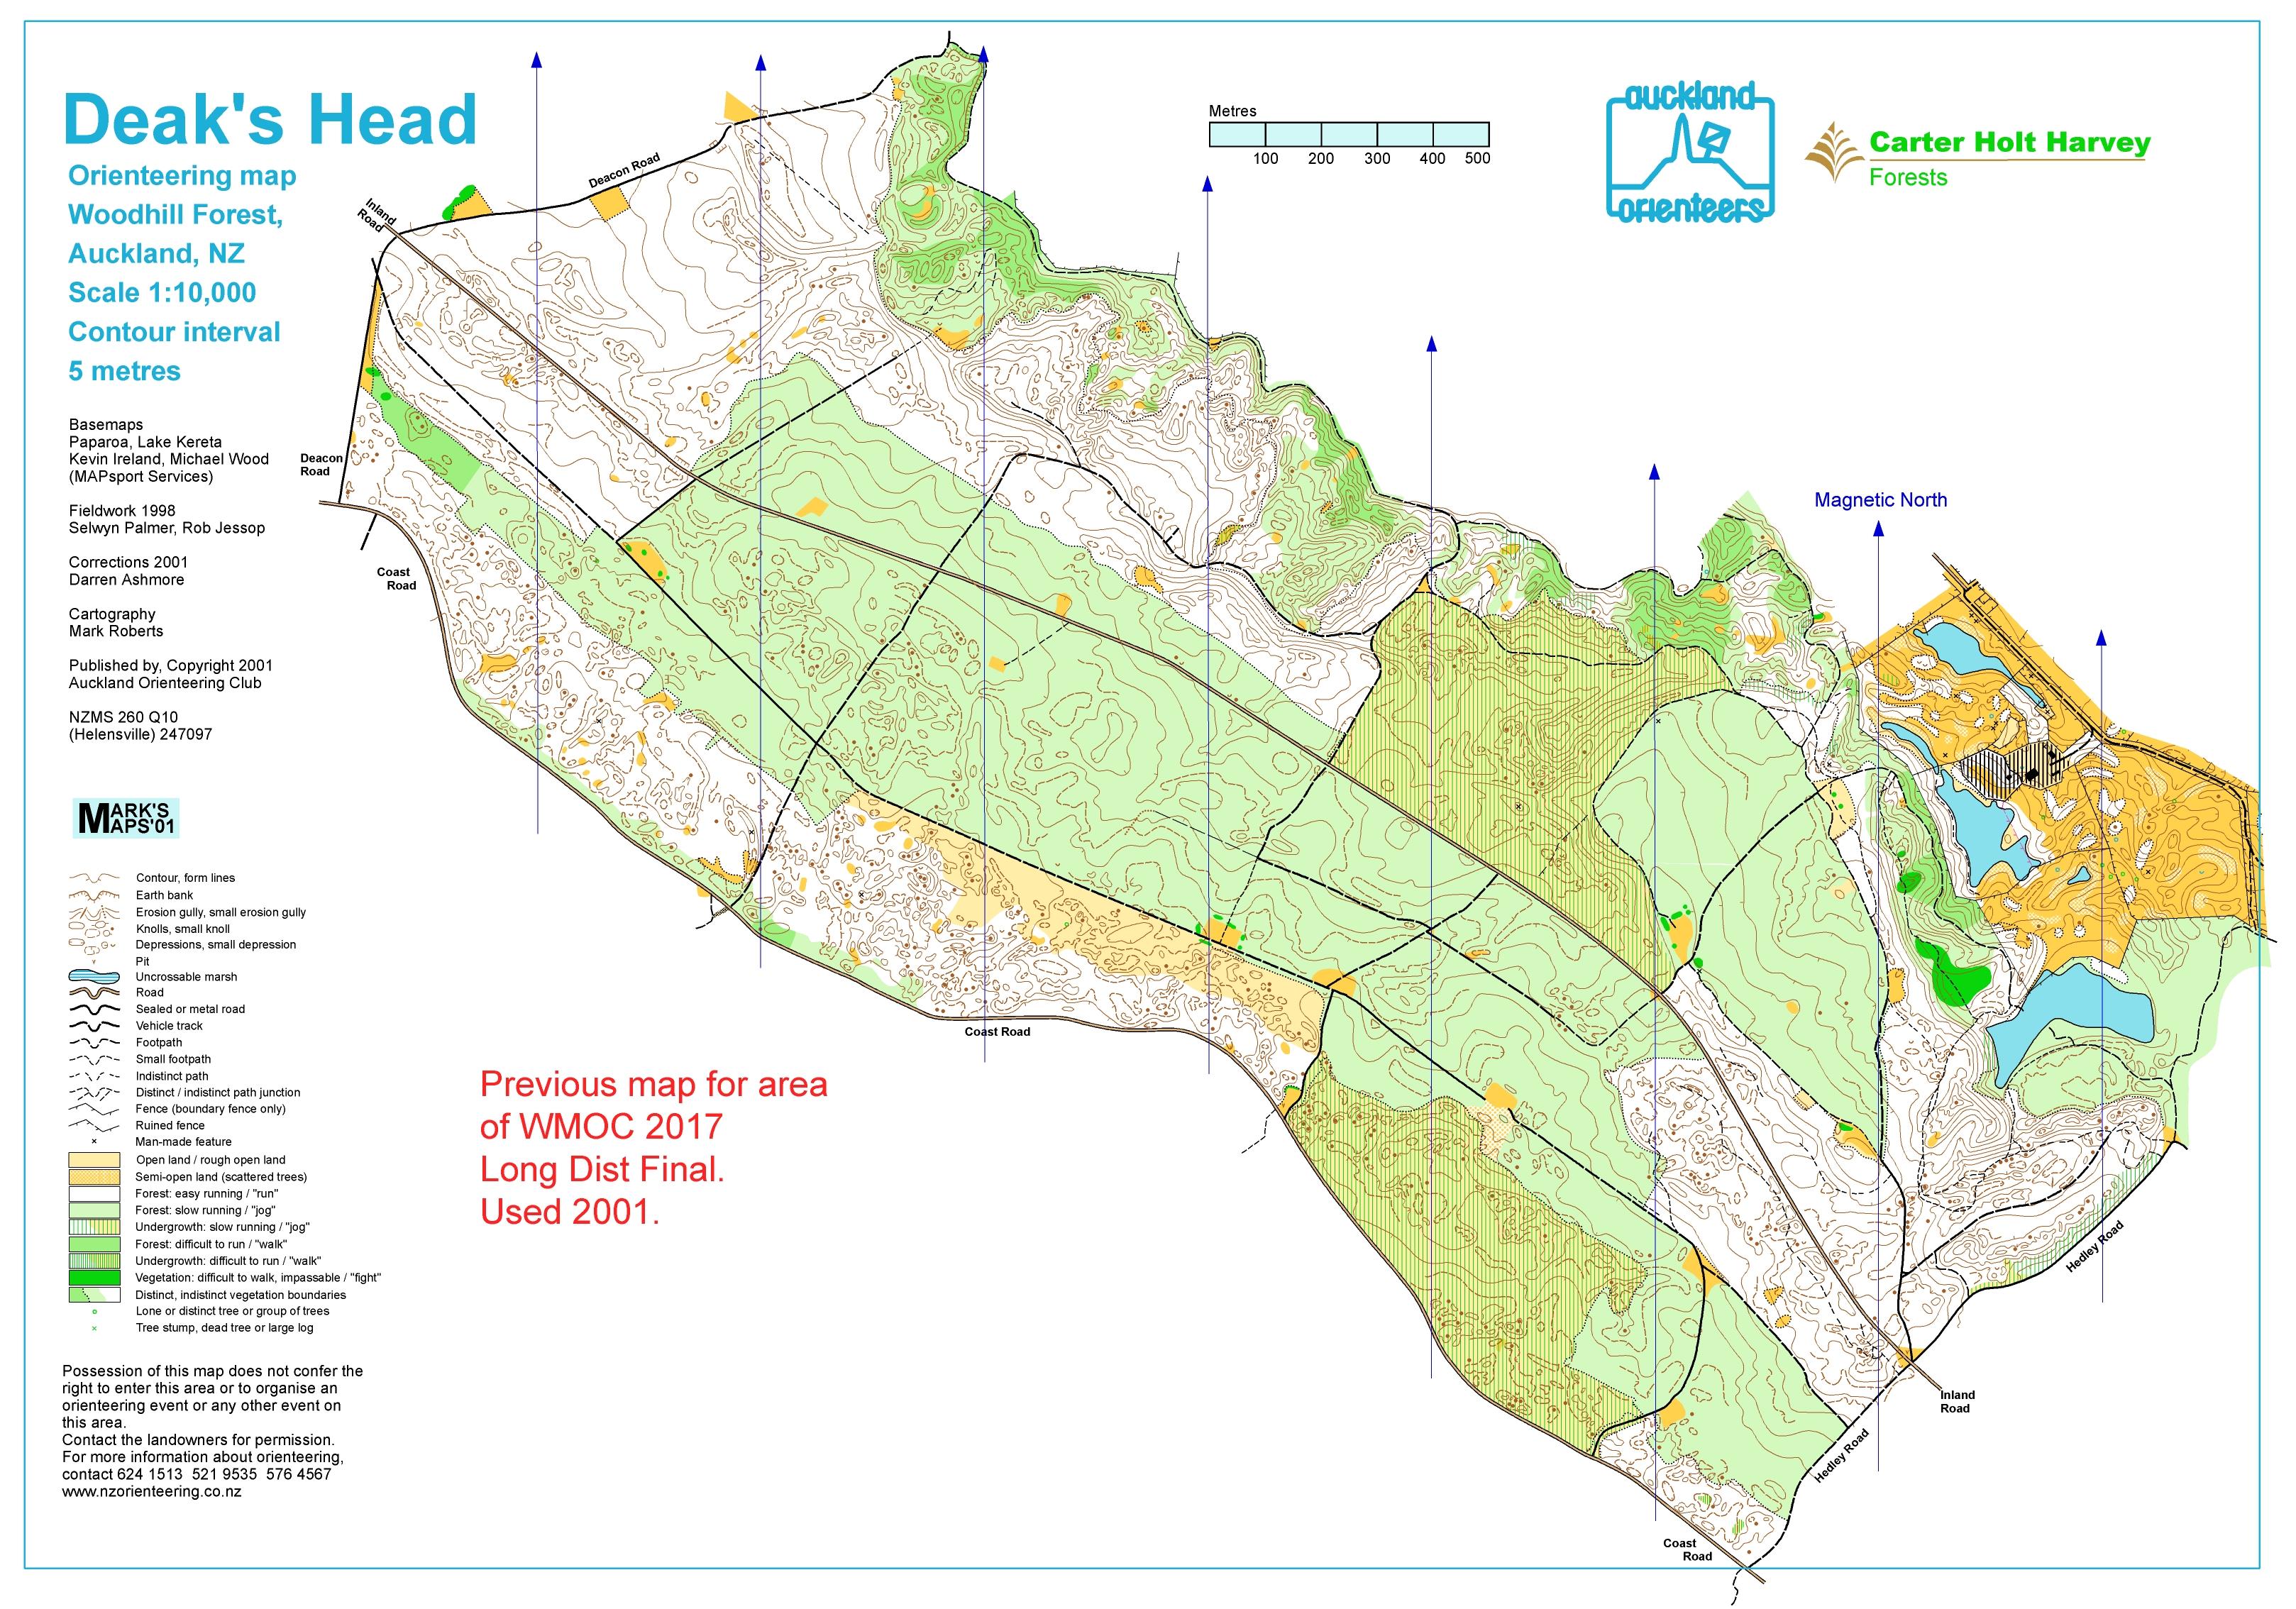 World masters games 2017 world masters orienteering wmoc2017 old maps long distance final woodhill deaks head 2001 biocorpaavc